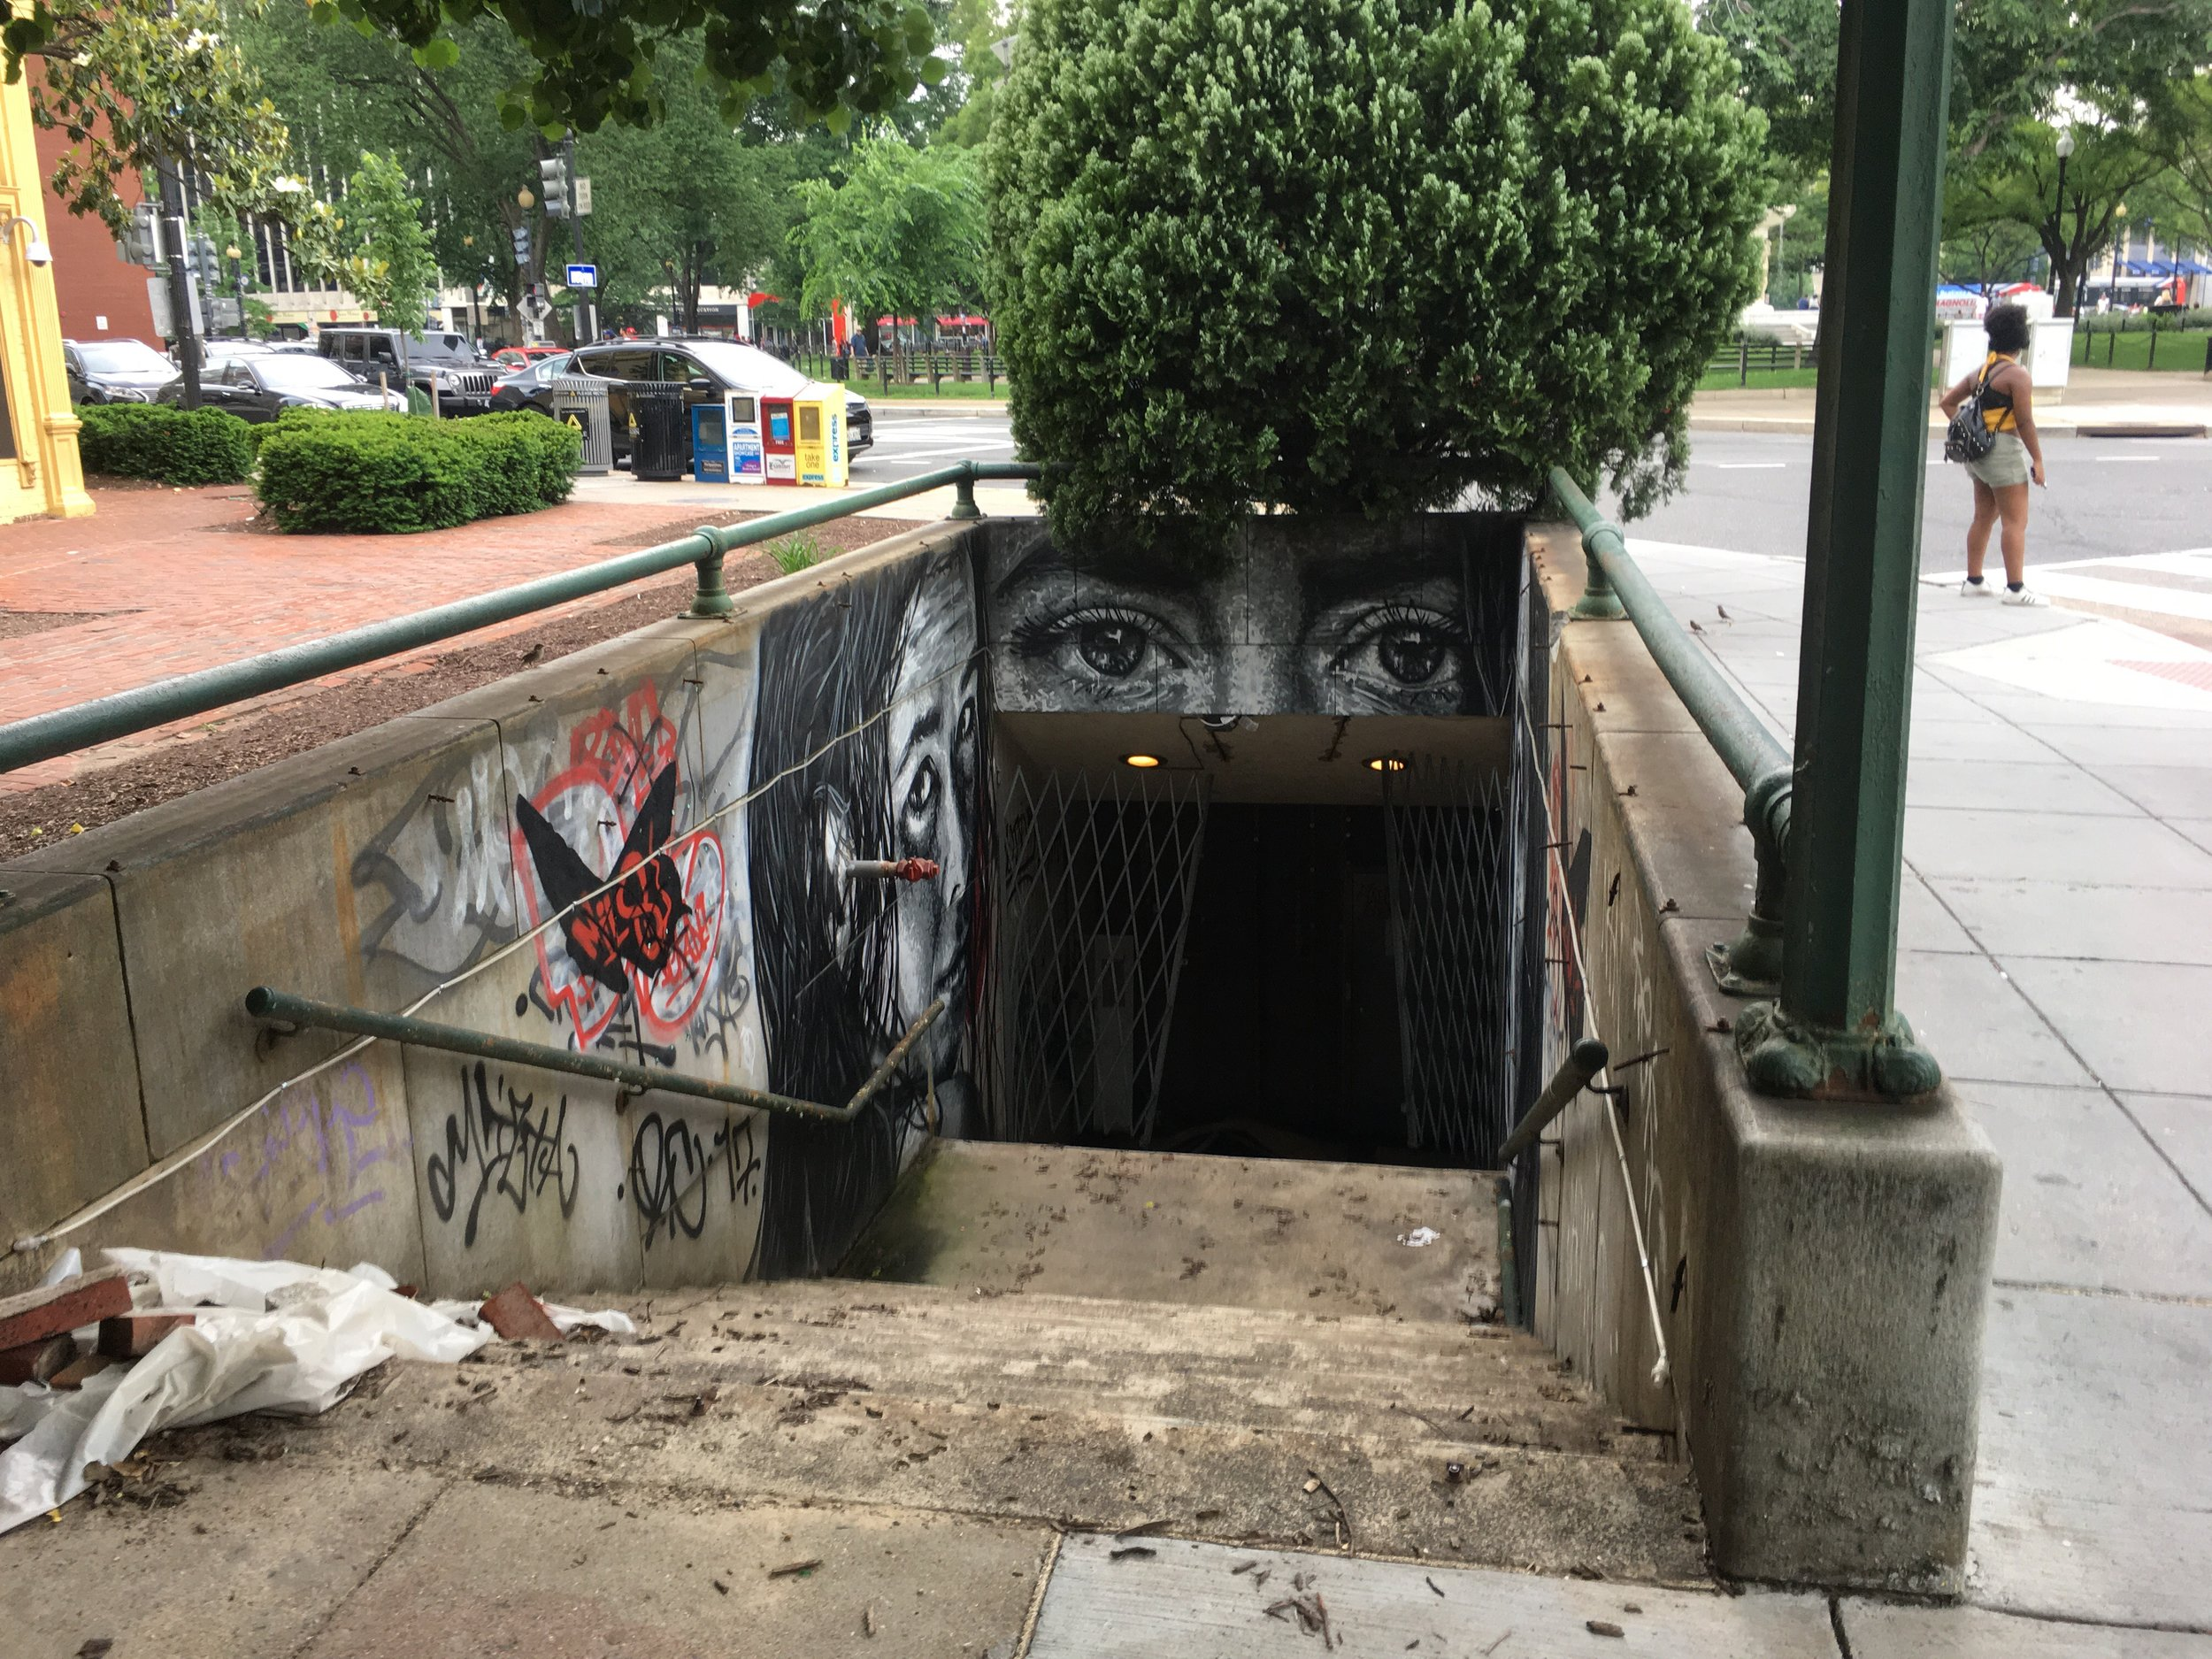 The Massachusetts Avenue entrance has a mural. Photo: Elliot Carter